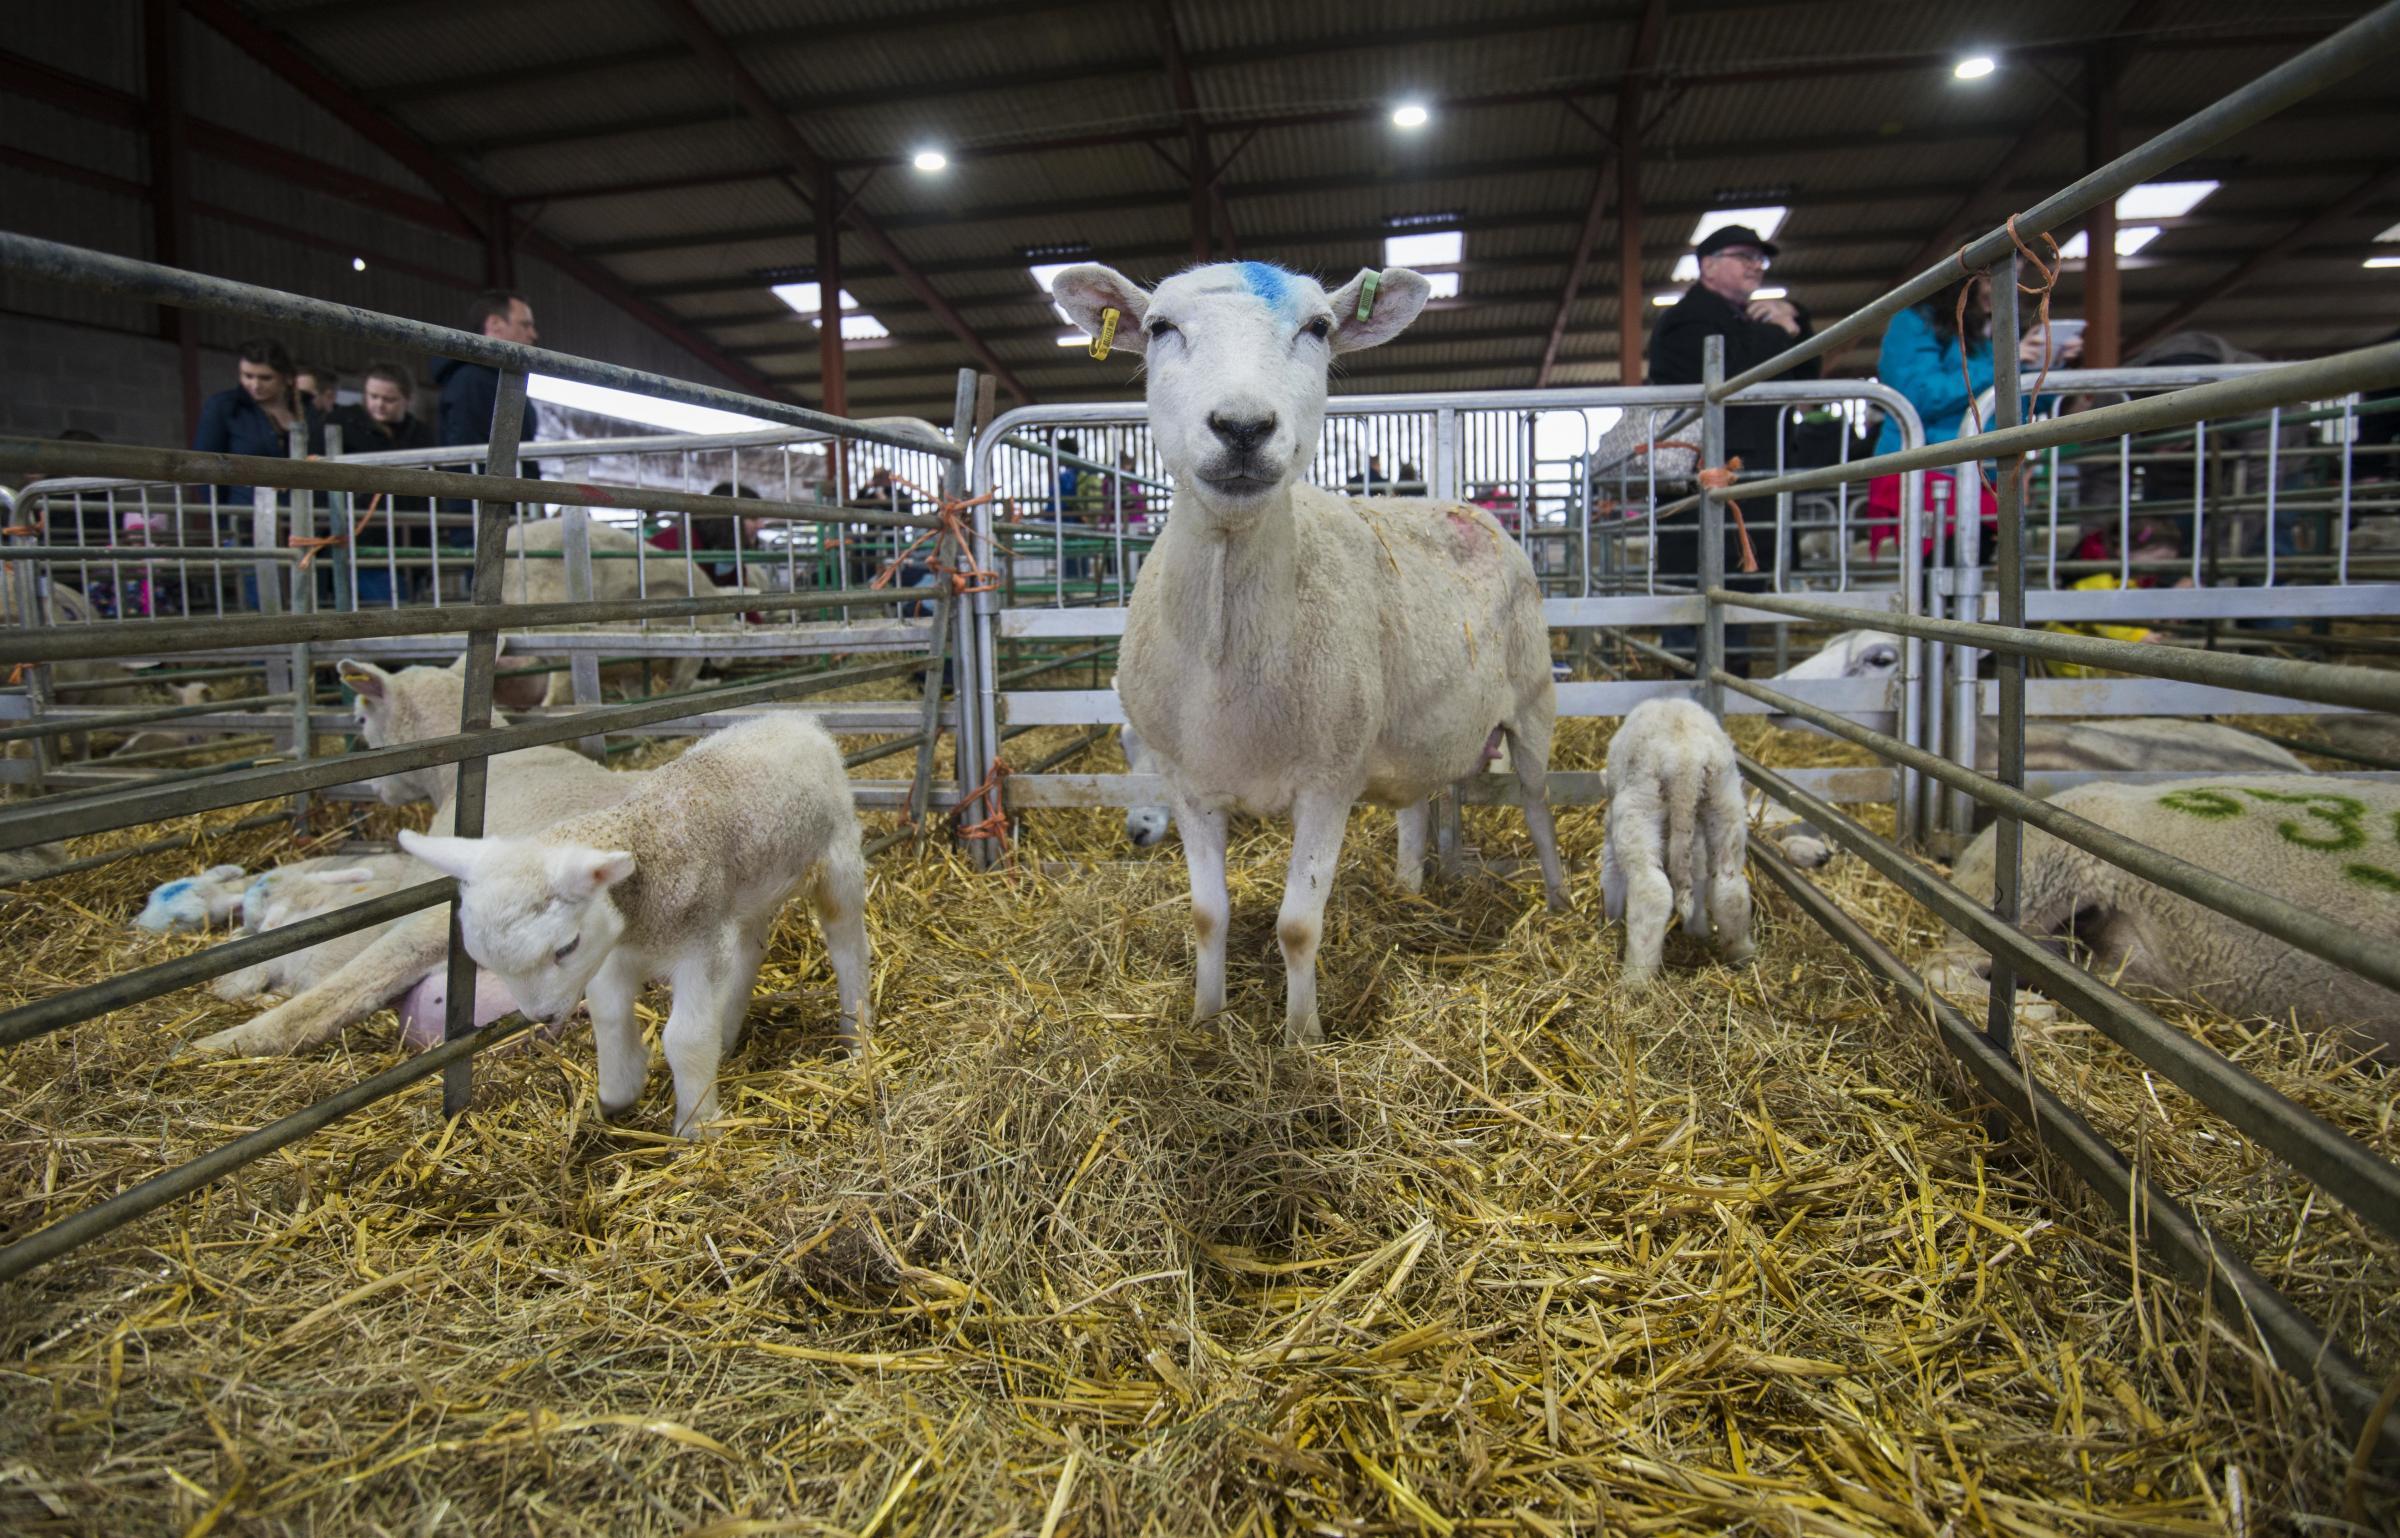 Spring lambs on display at Lackham this weekend